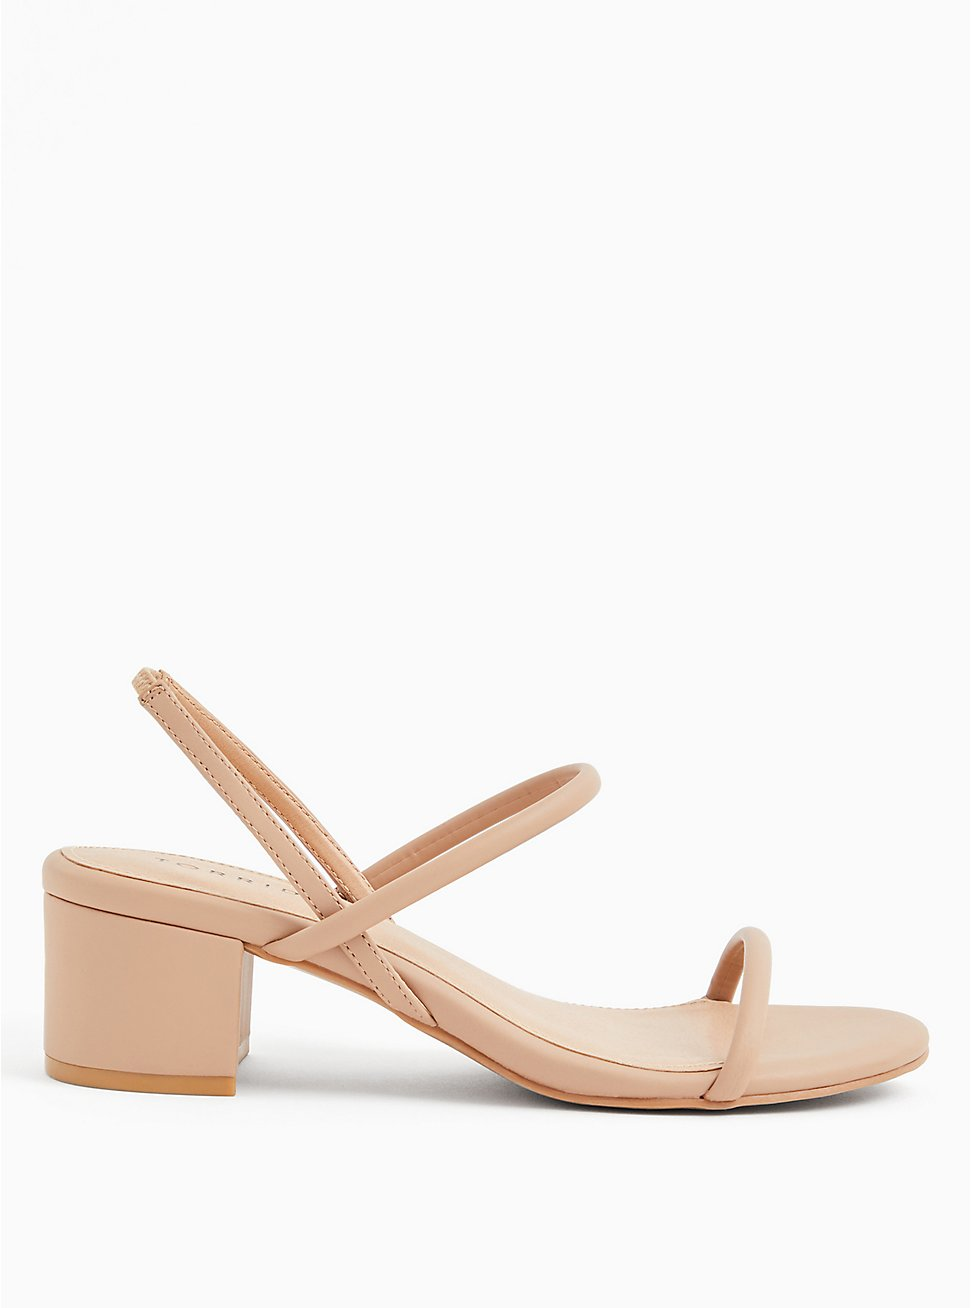 Beige Faux Leather Slingback Block Heel (WW), , hi-res